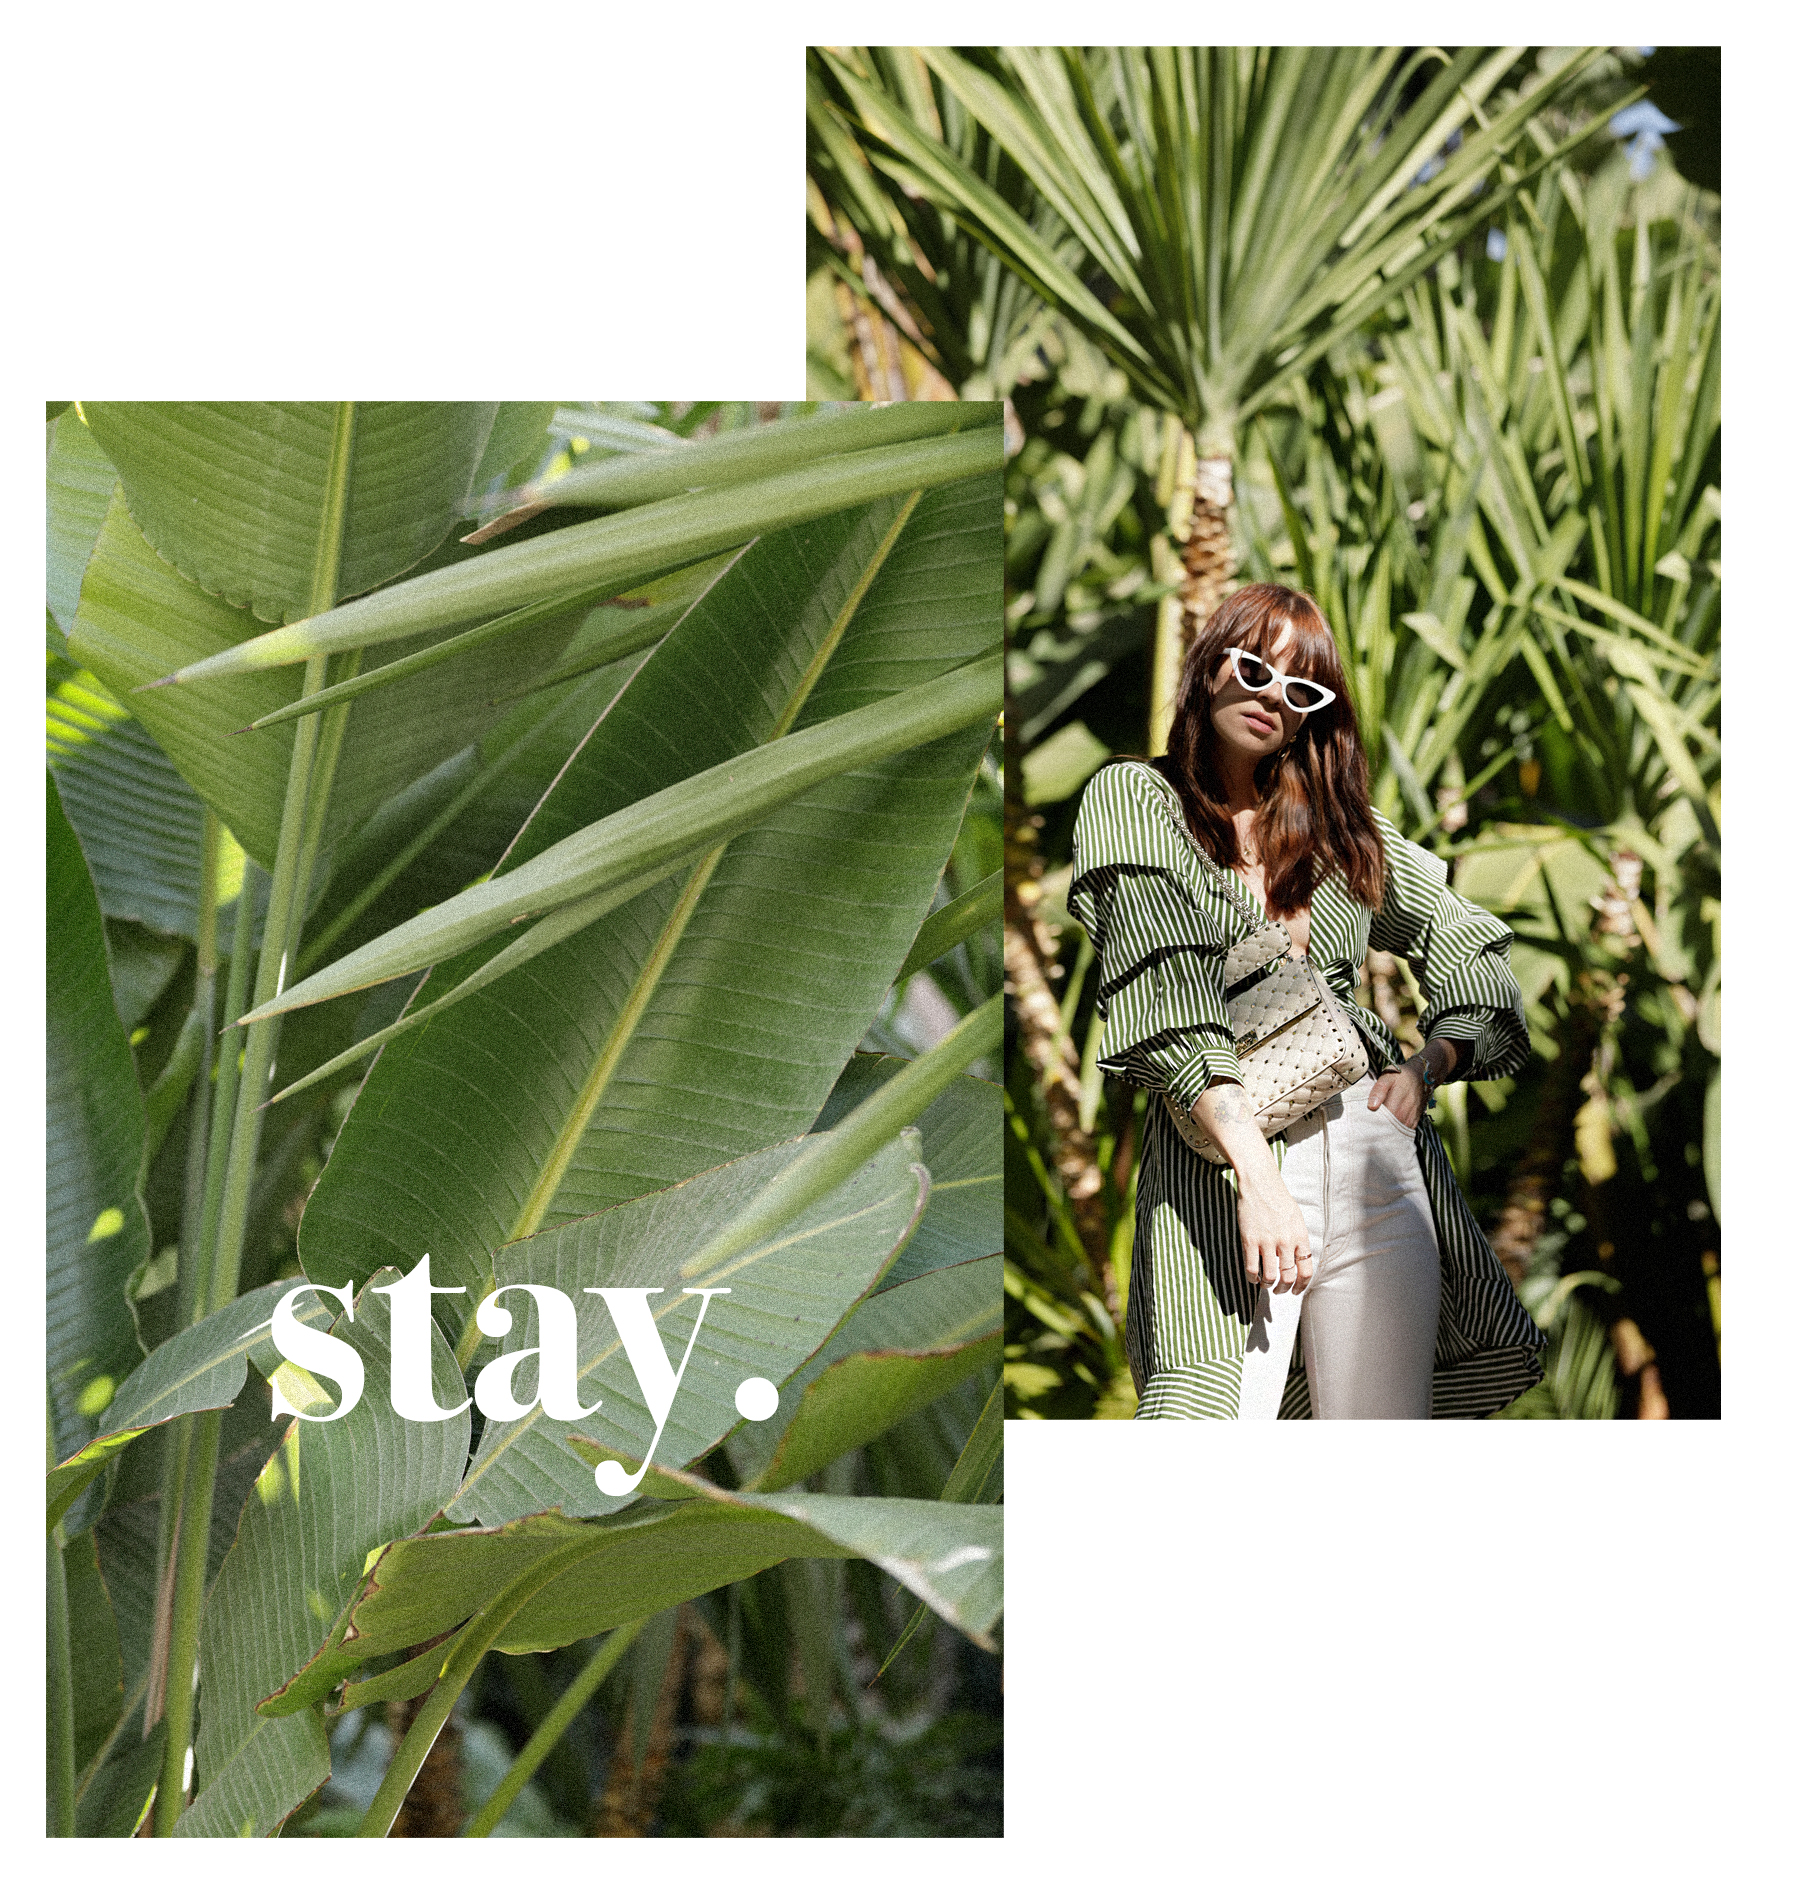 selman marrakech jungle palm tree banana leaves green dress vila breuninger maison valentino hermès oran adam selman x le specs sunglasses last lolita dress as top stripes green max bechmann fotografie film düsseldorf ricarda schernus catsanddogsblog 2